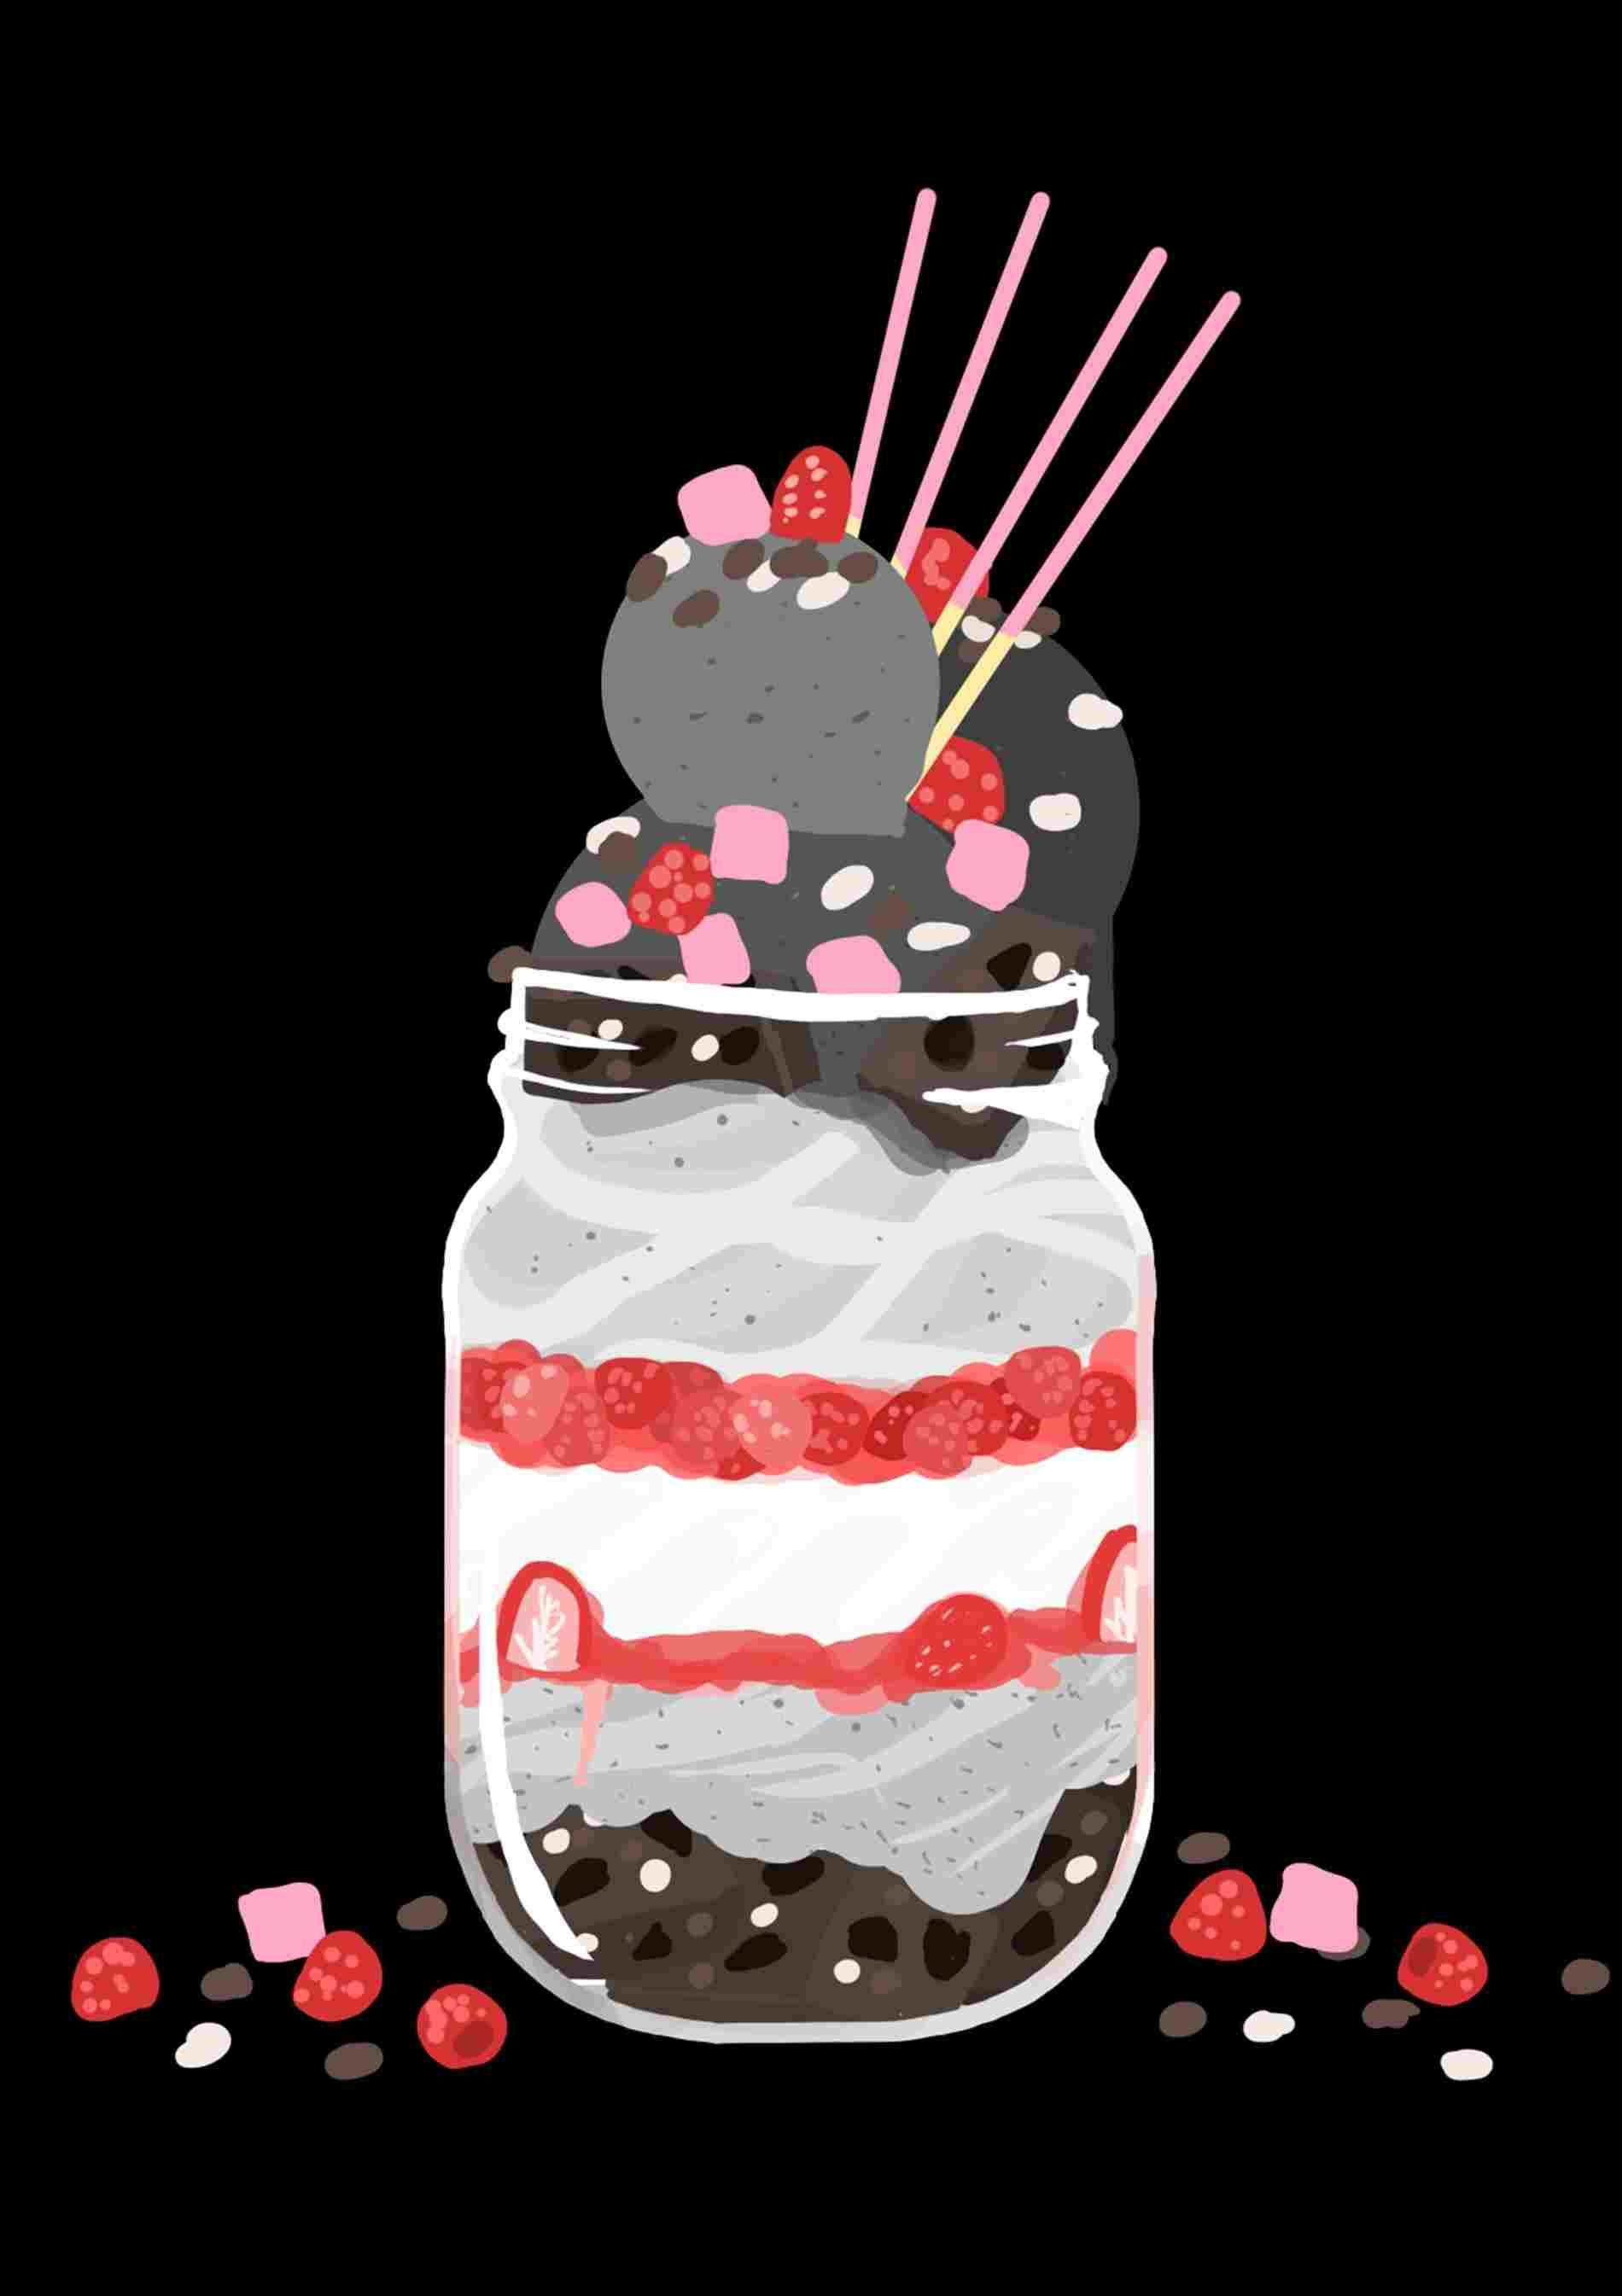 Cake Tumblr These Wedding Birthday Cake Cake Birthday Cake